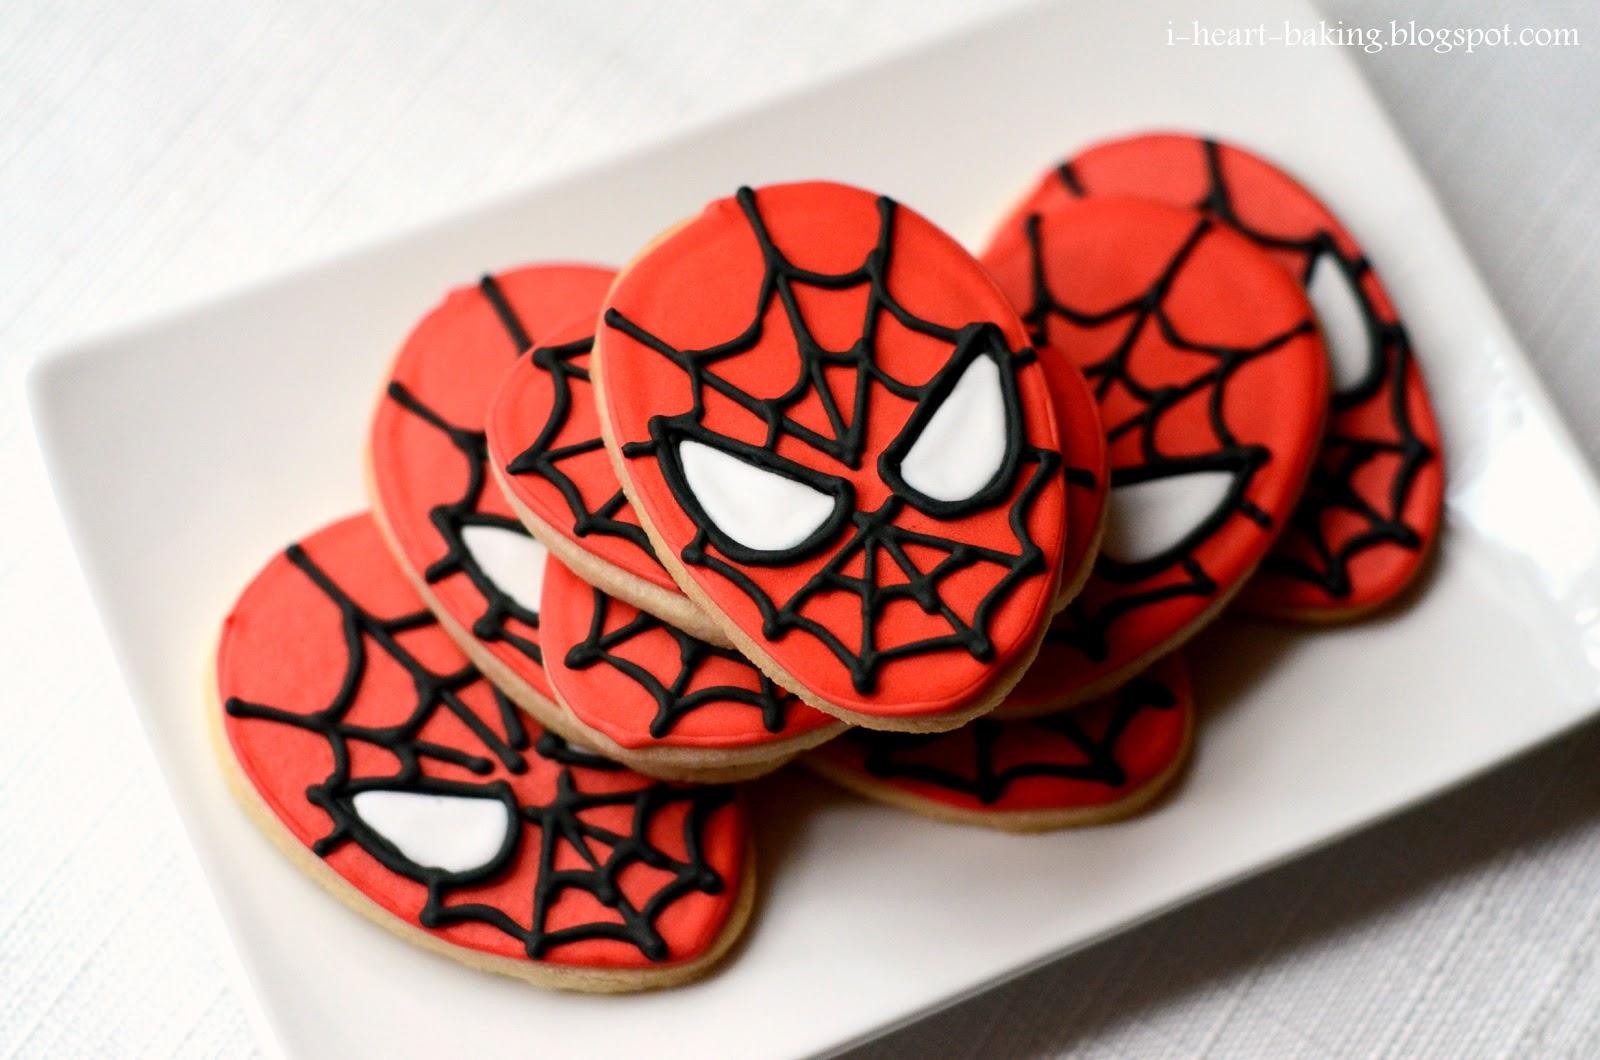 I Heart Baking Spiderman Cookies